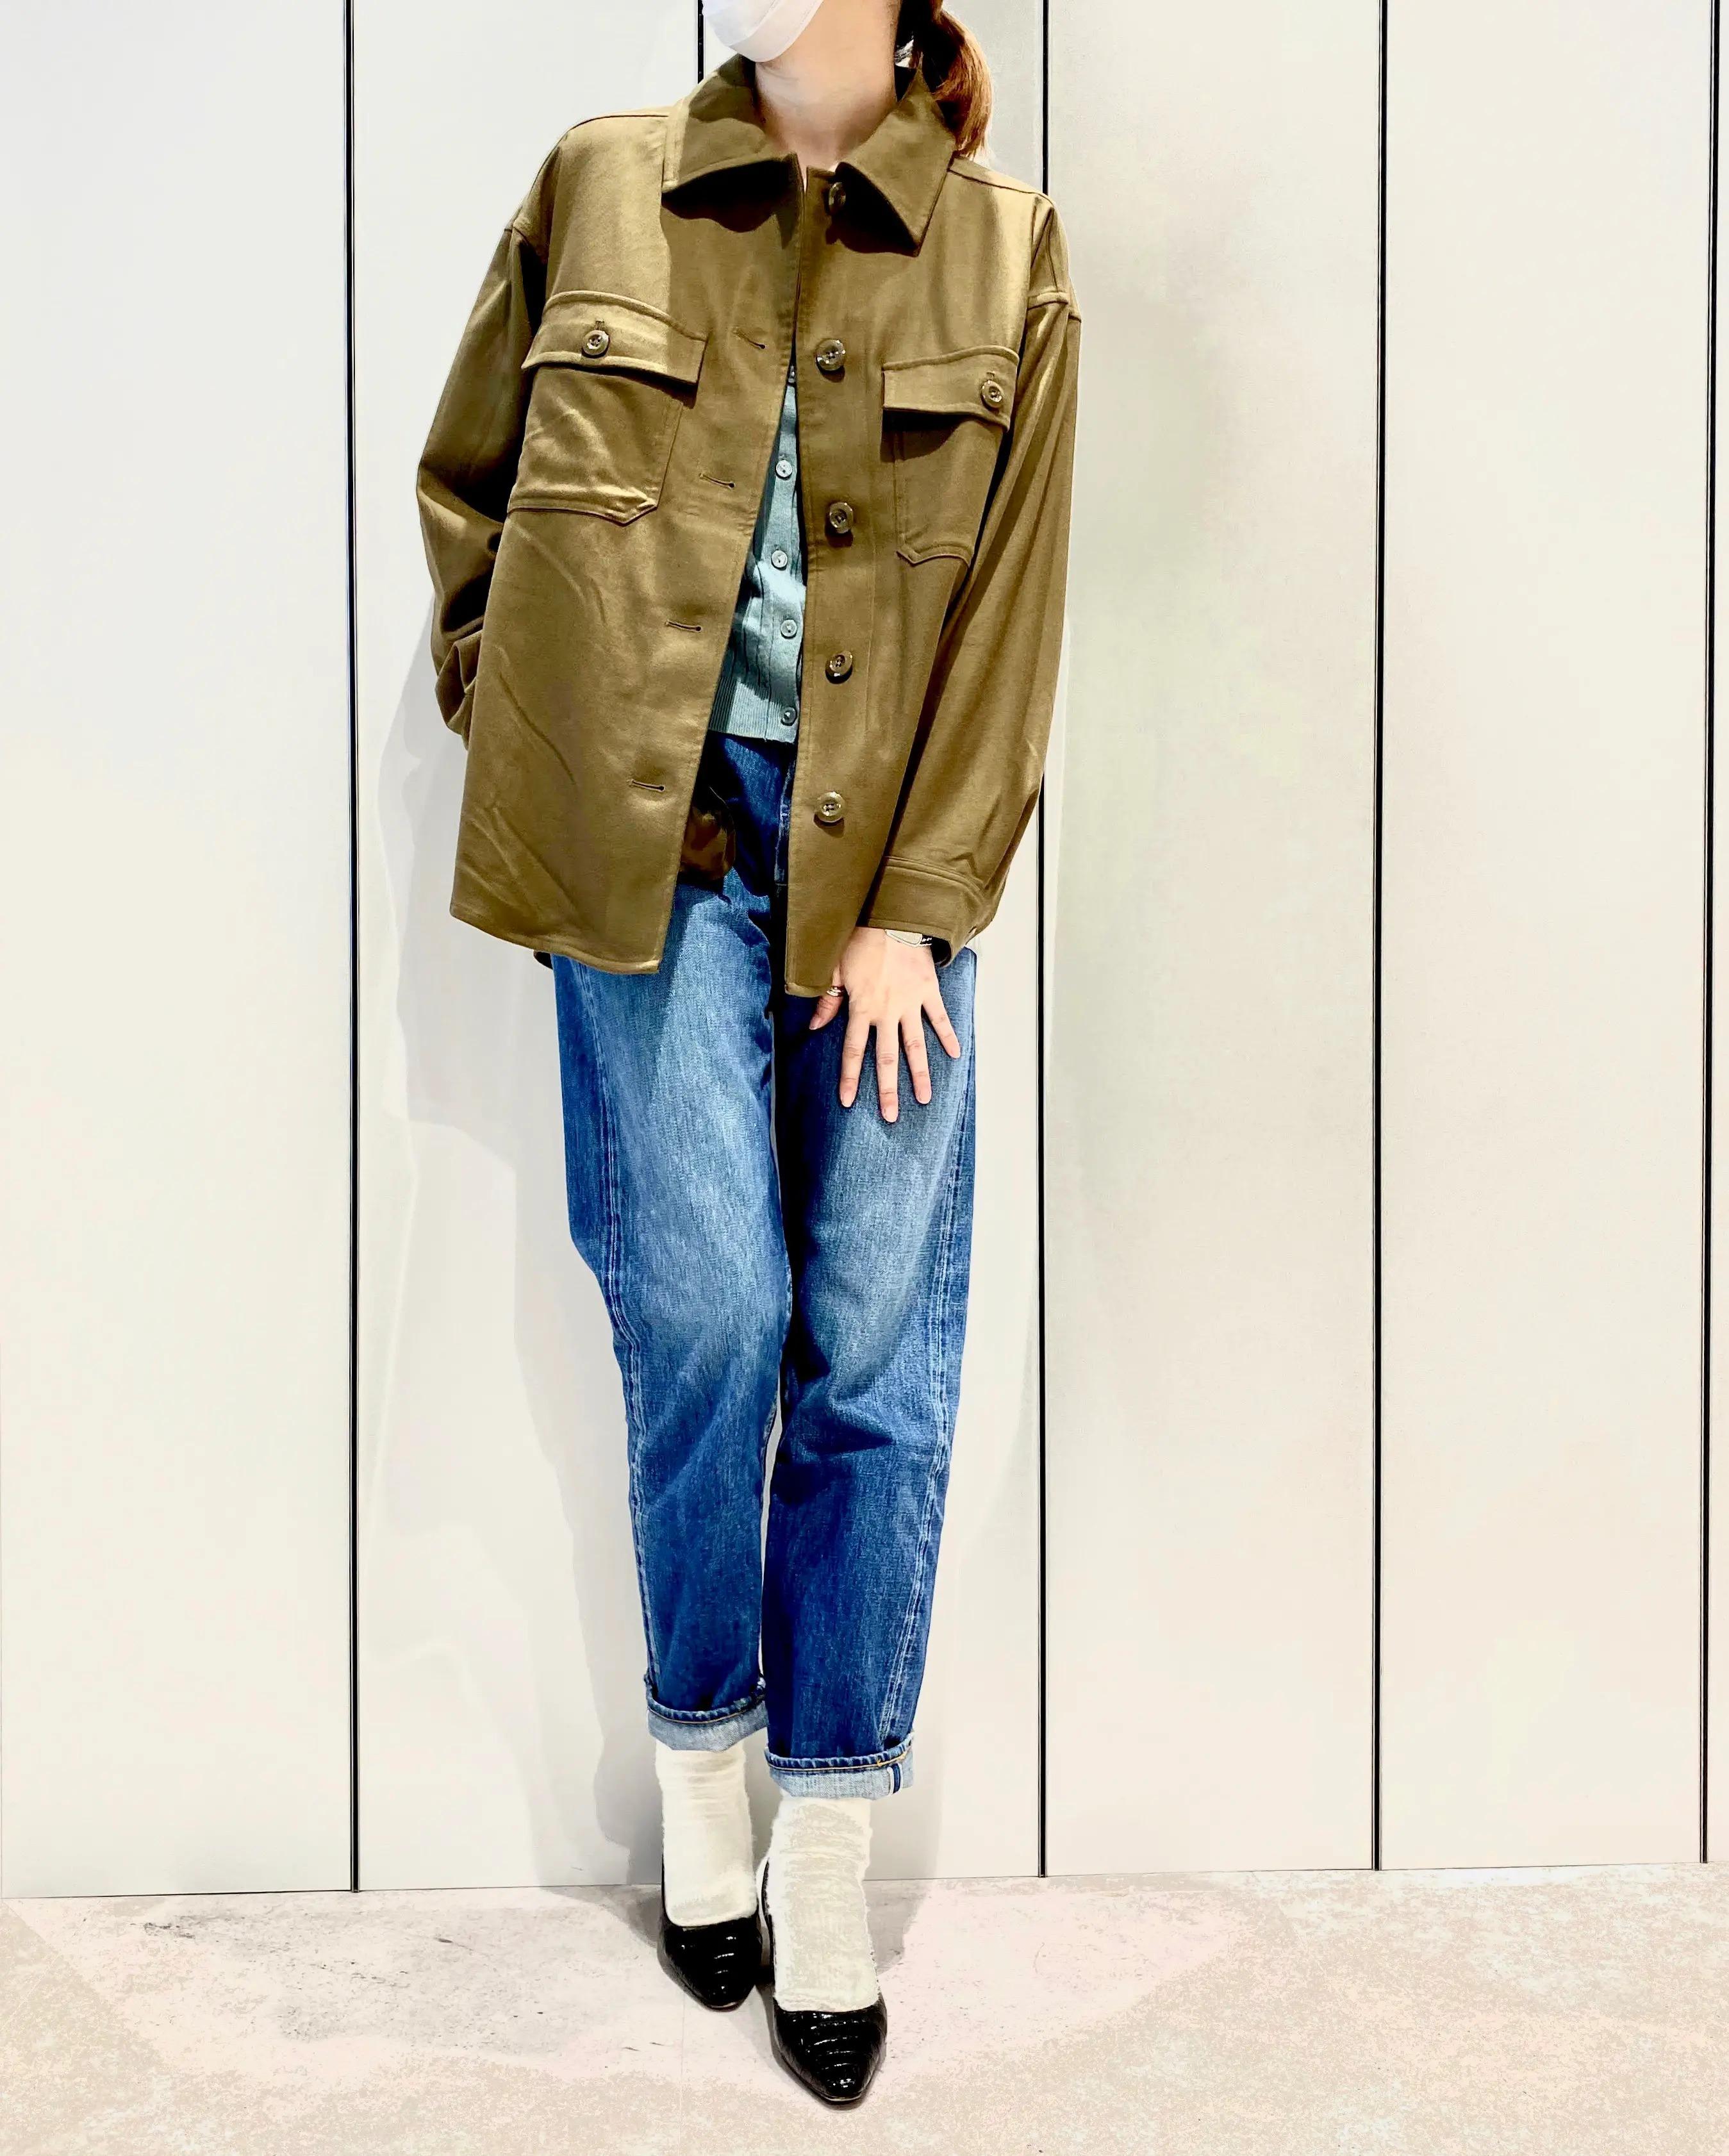 『GU』アウター、本気買いしたいのは? Snow Man向井康二が脚本デビュー!【今週のファッション人気ランキング】_3